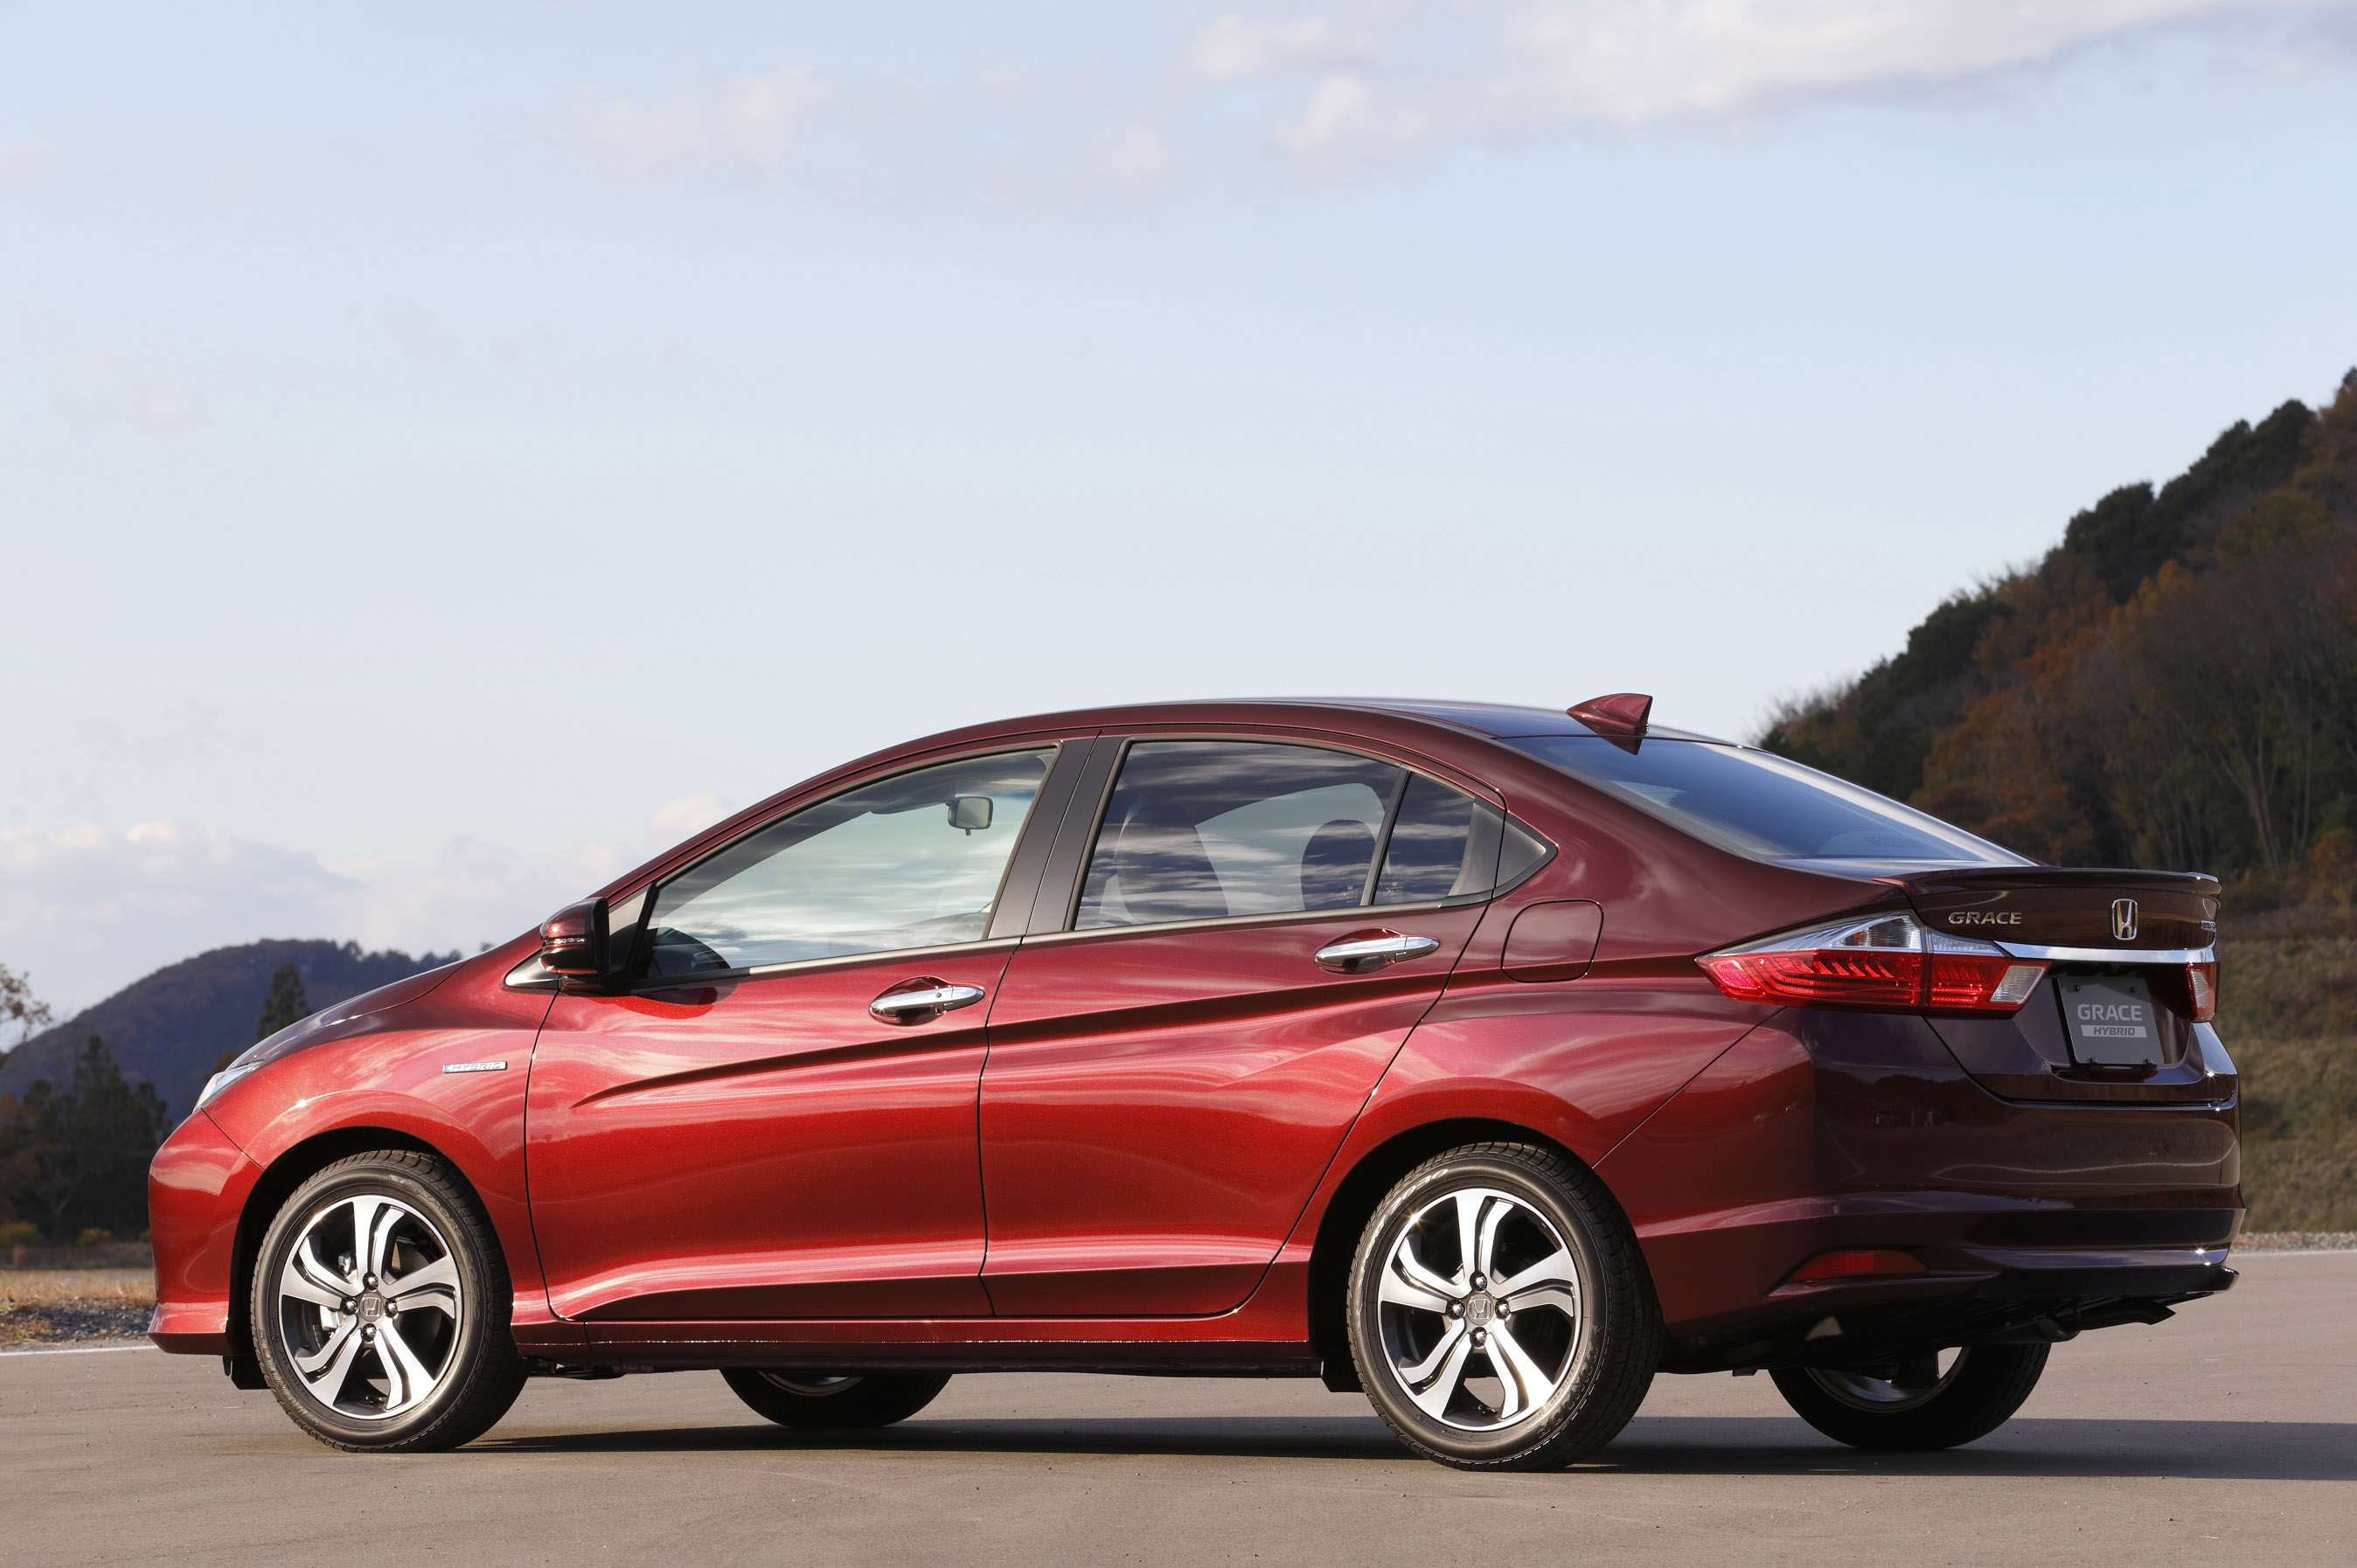 Honda Introduces Most Efficient Hybrid Sedan Named Quot Grace Quot